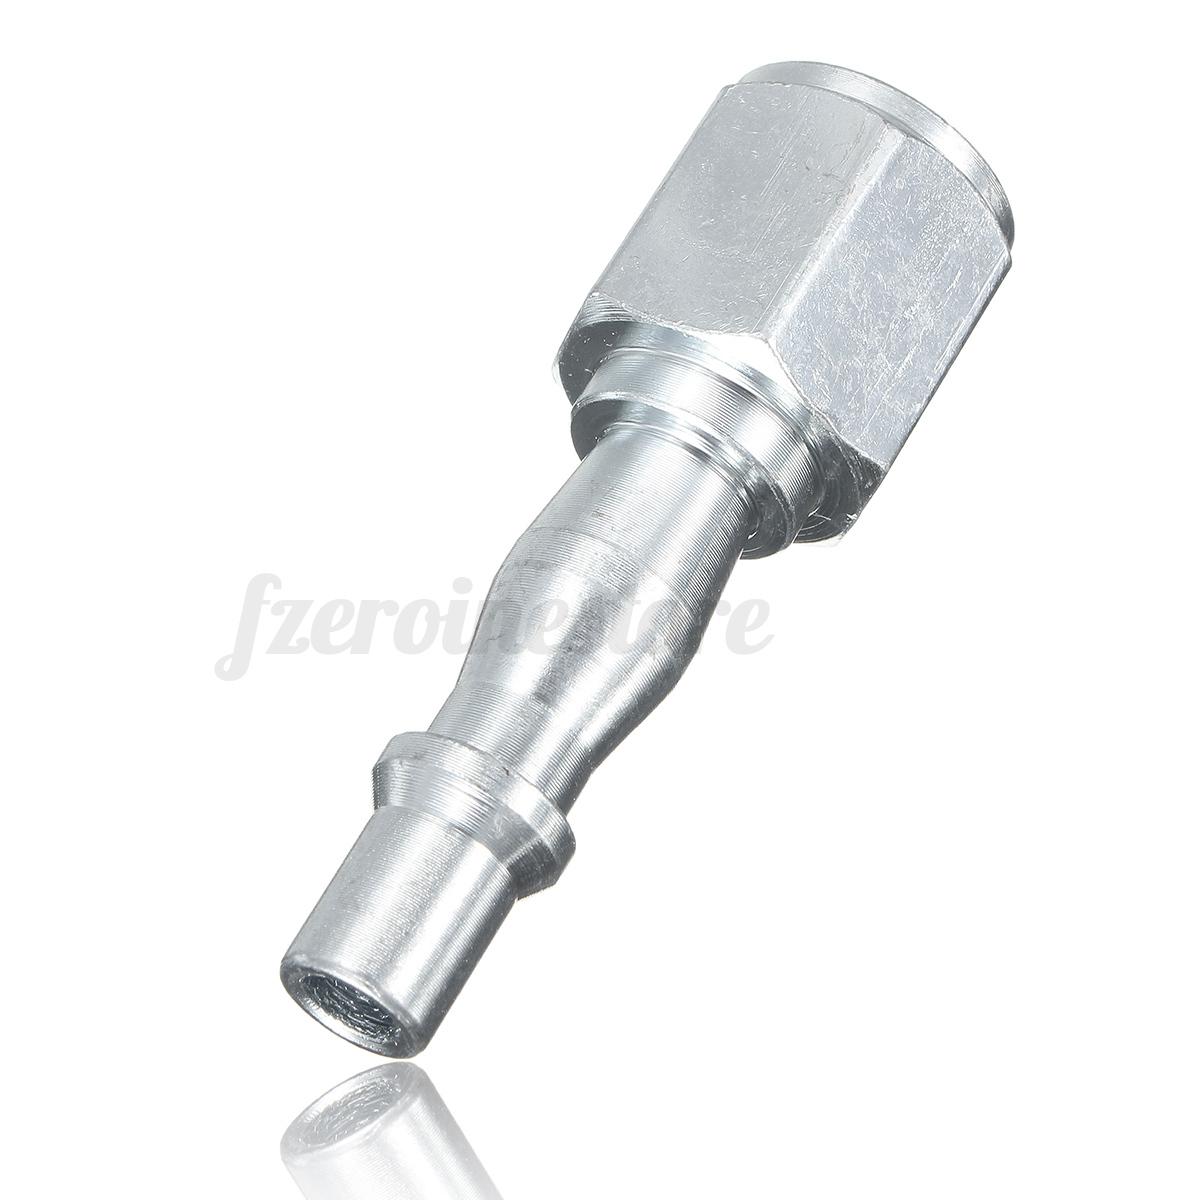 Air line hose fittings compressor connectors male female